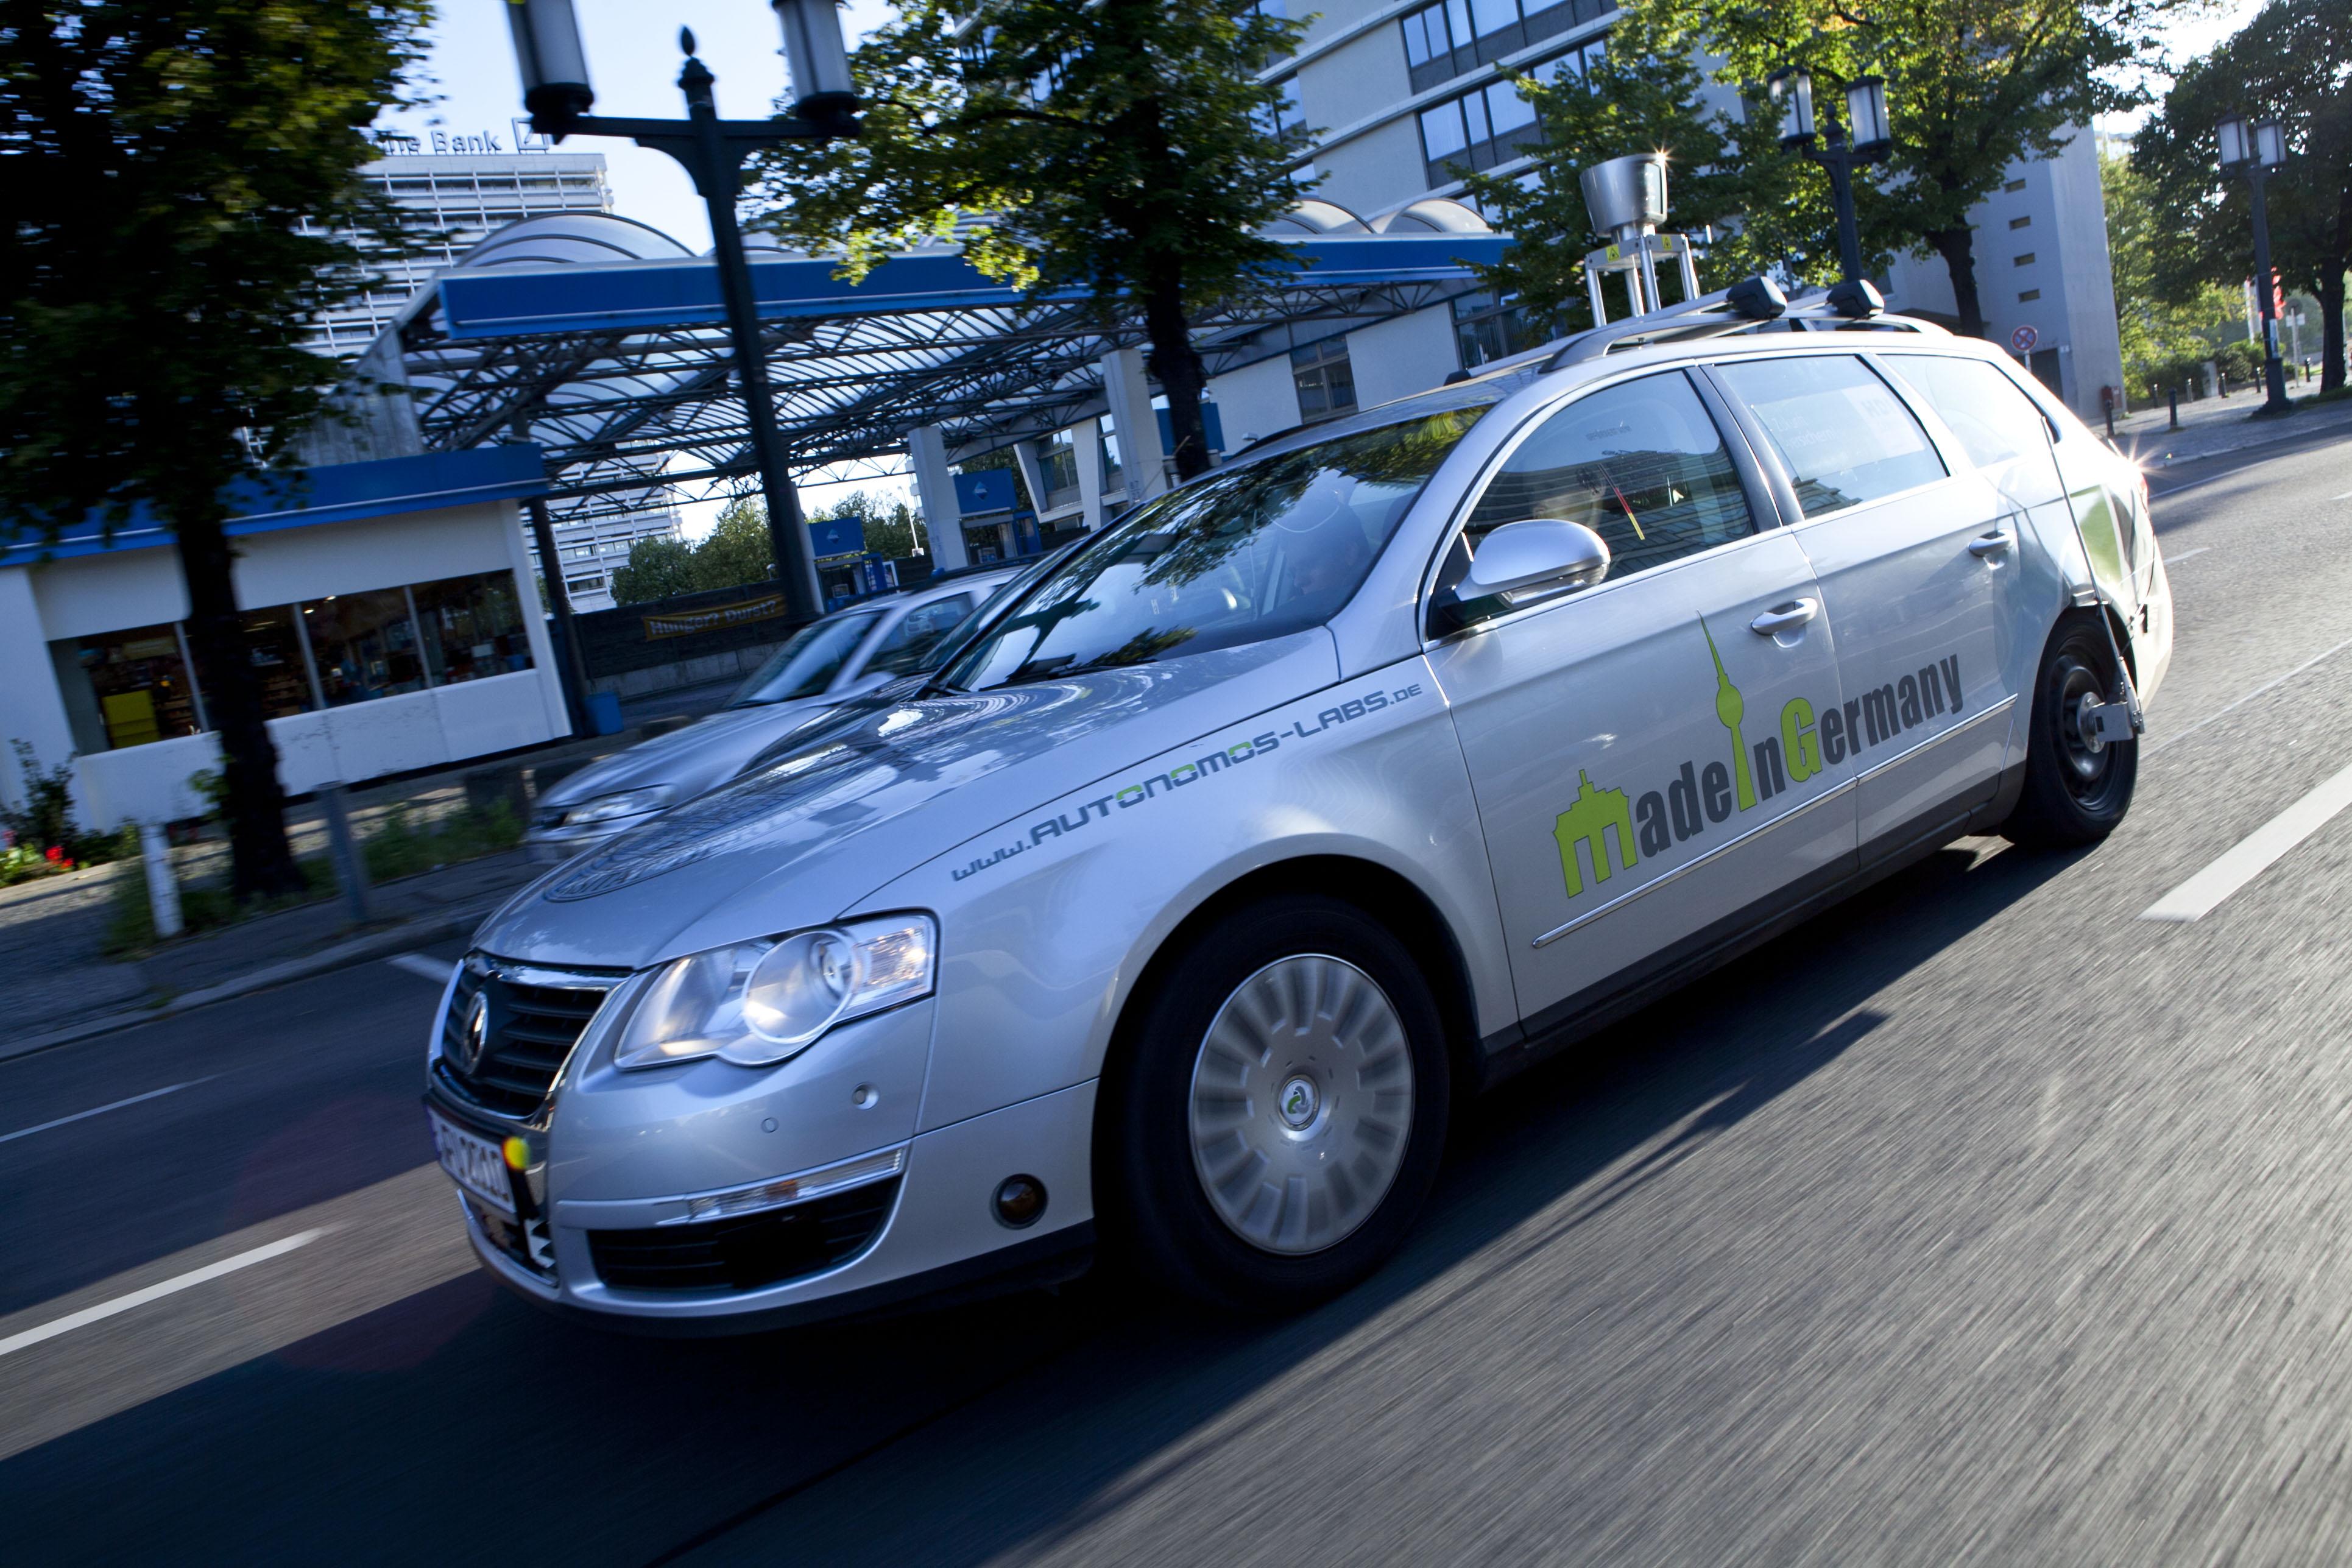 autonomos_mission_brandenbug_gate_2011_(6)